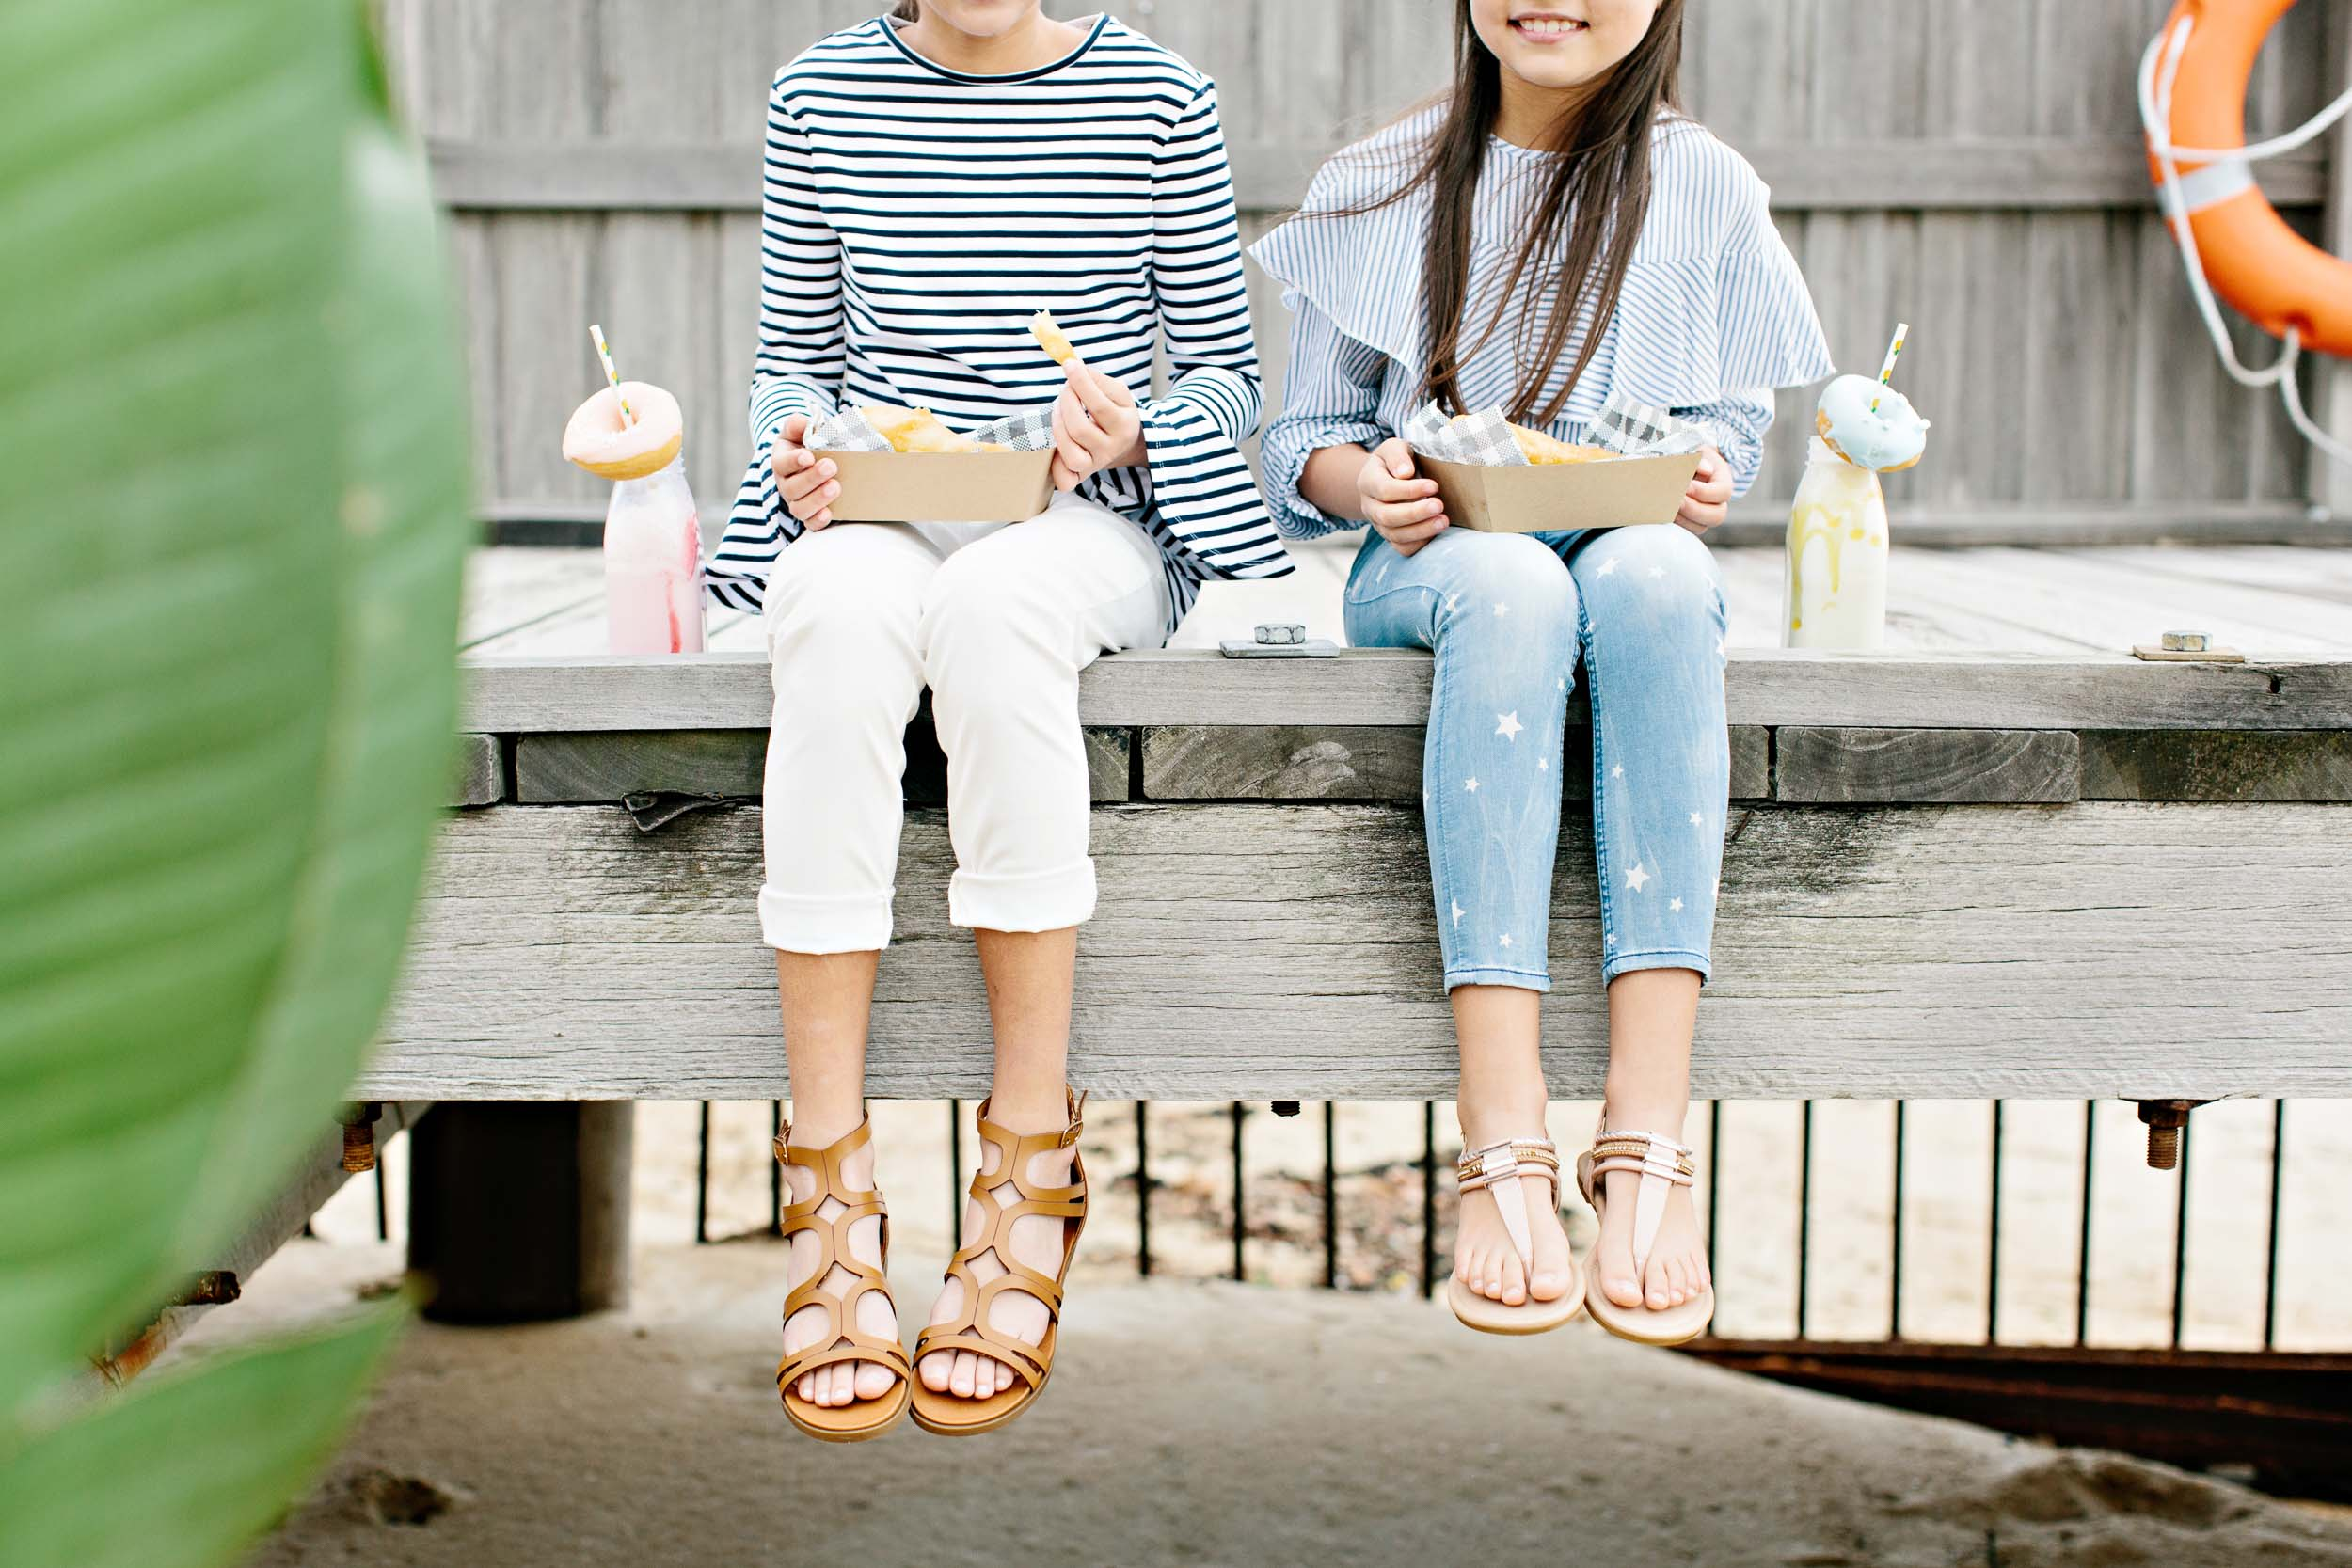 Kas-Richards-LENZO_Betts-Kids-Shoes-202.jpg